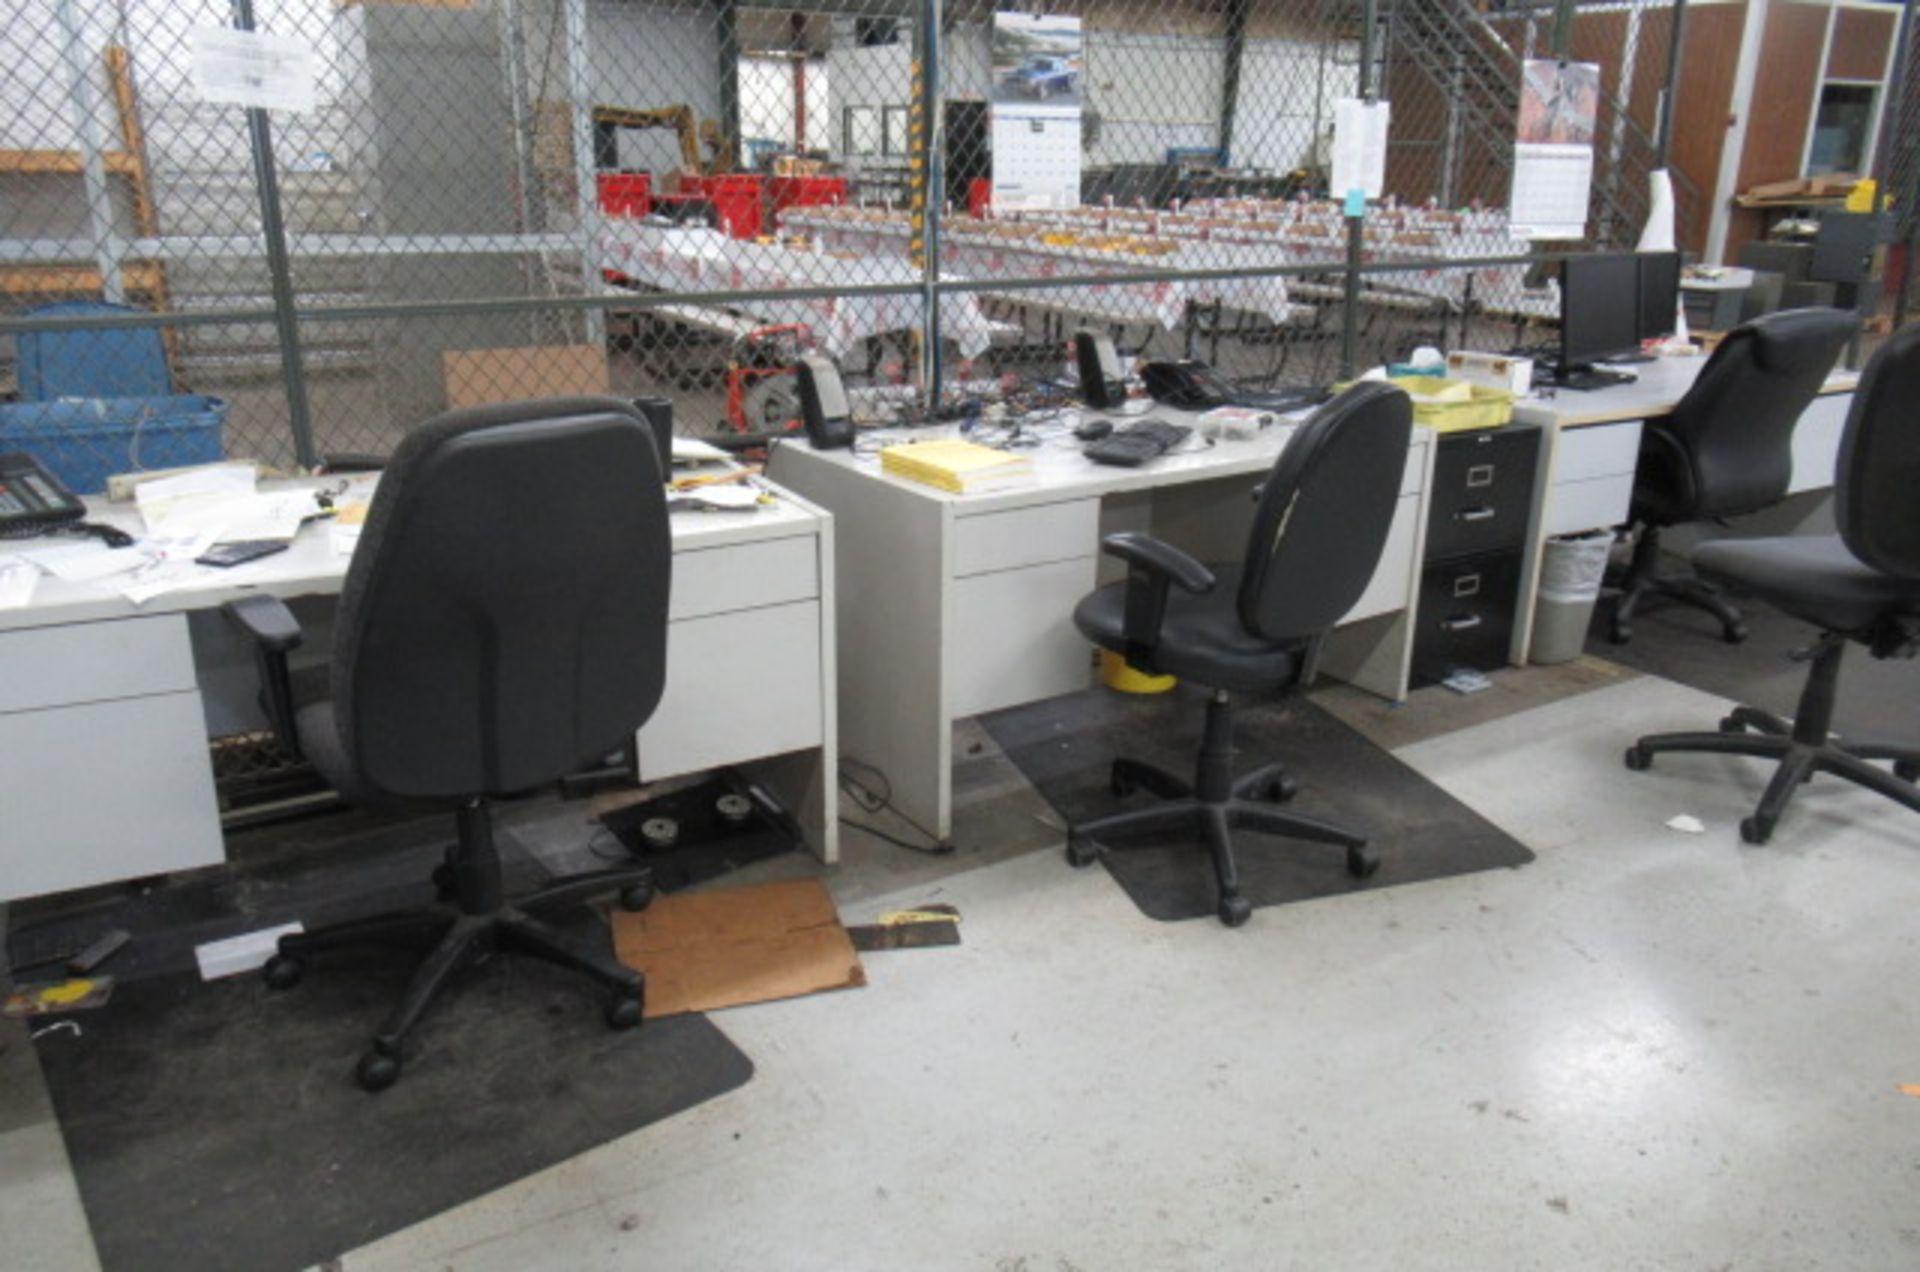 parts cage area 6 desks, 3 file cabinets, 2 Dell monitors, 3 key boards - Image 3 of 4